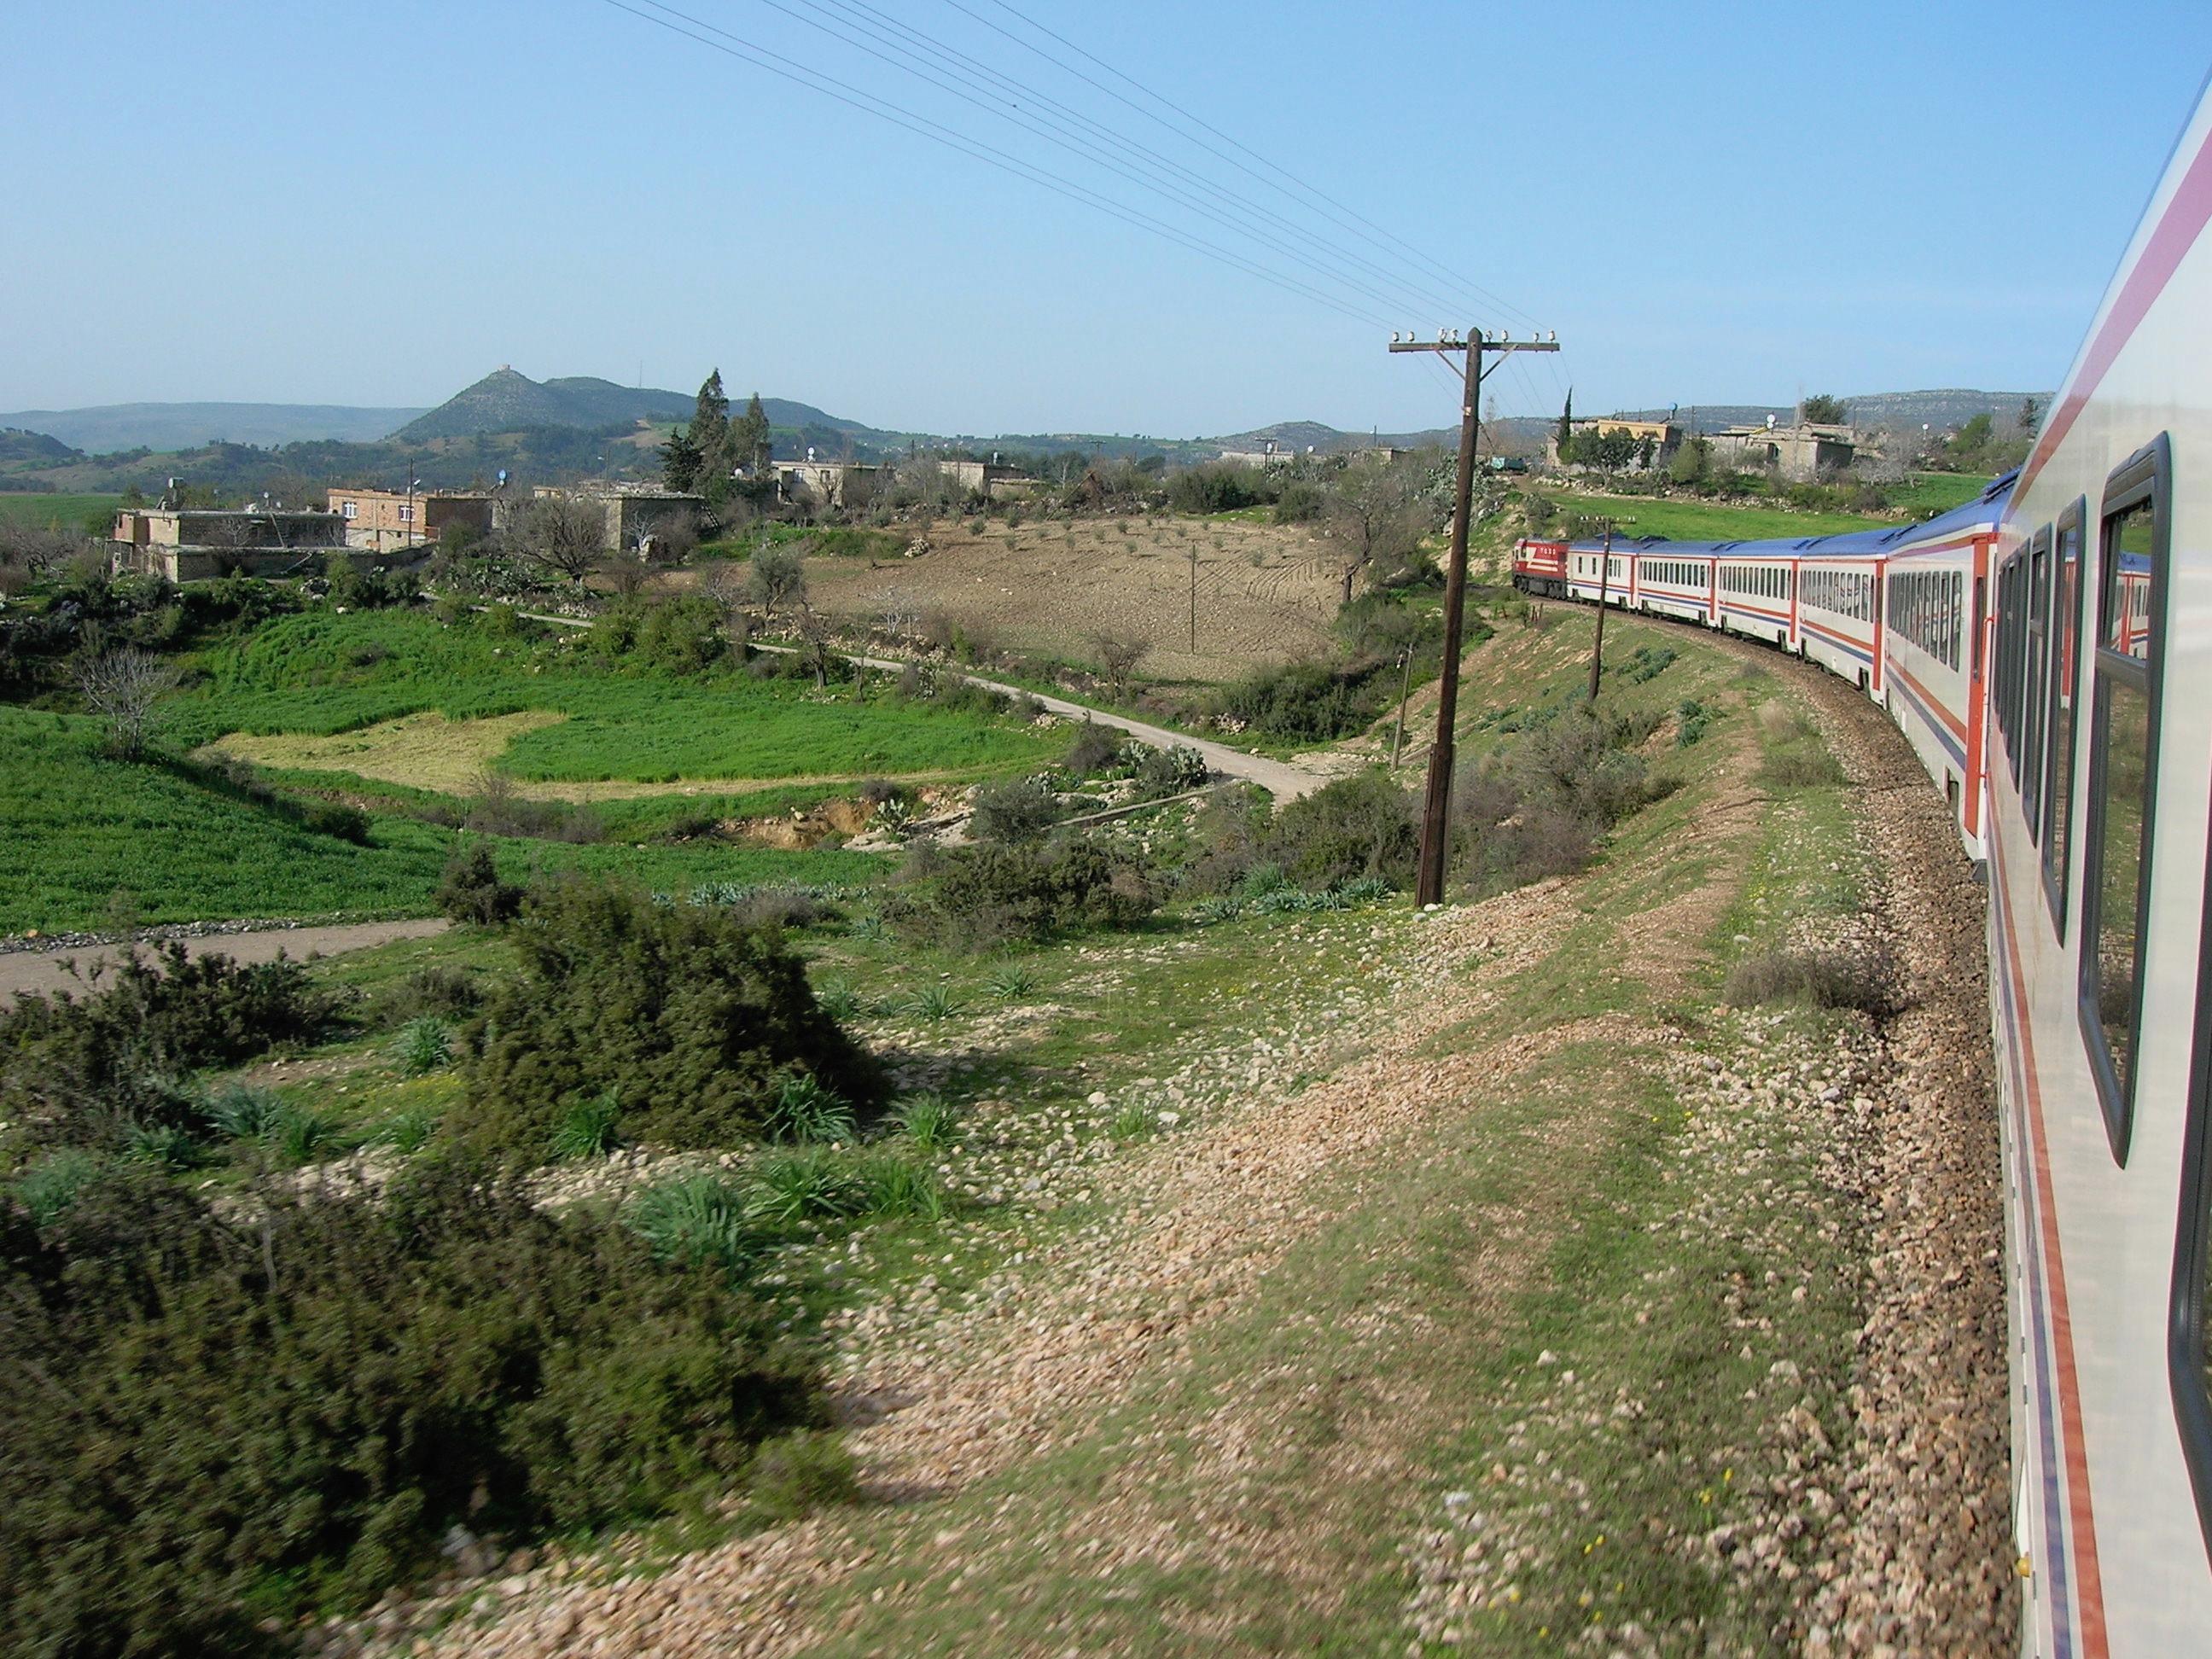 Dogu Express, Turkey